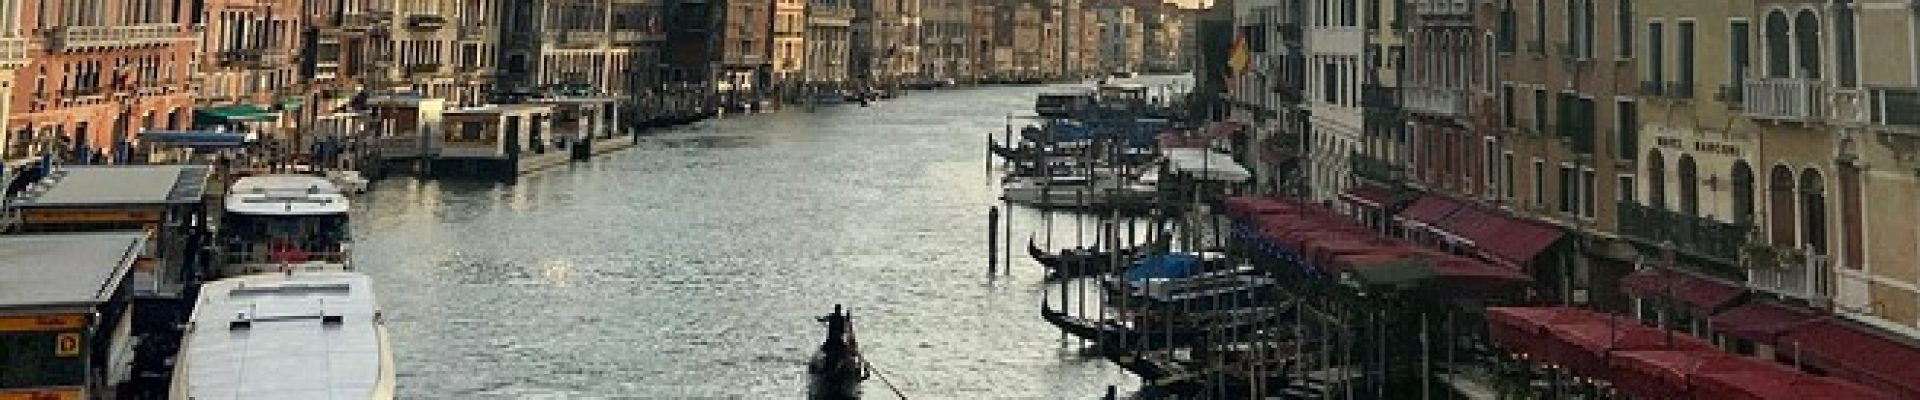 MW-IS236_Venice_20201028122352_ZQ.jpg